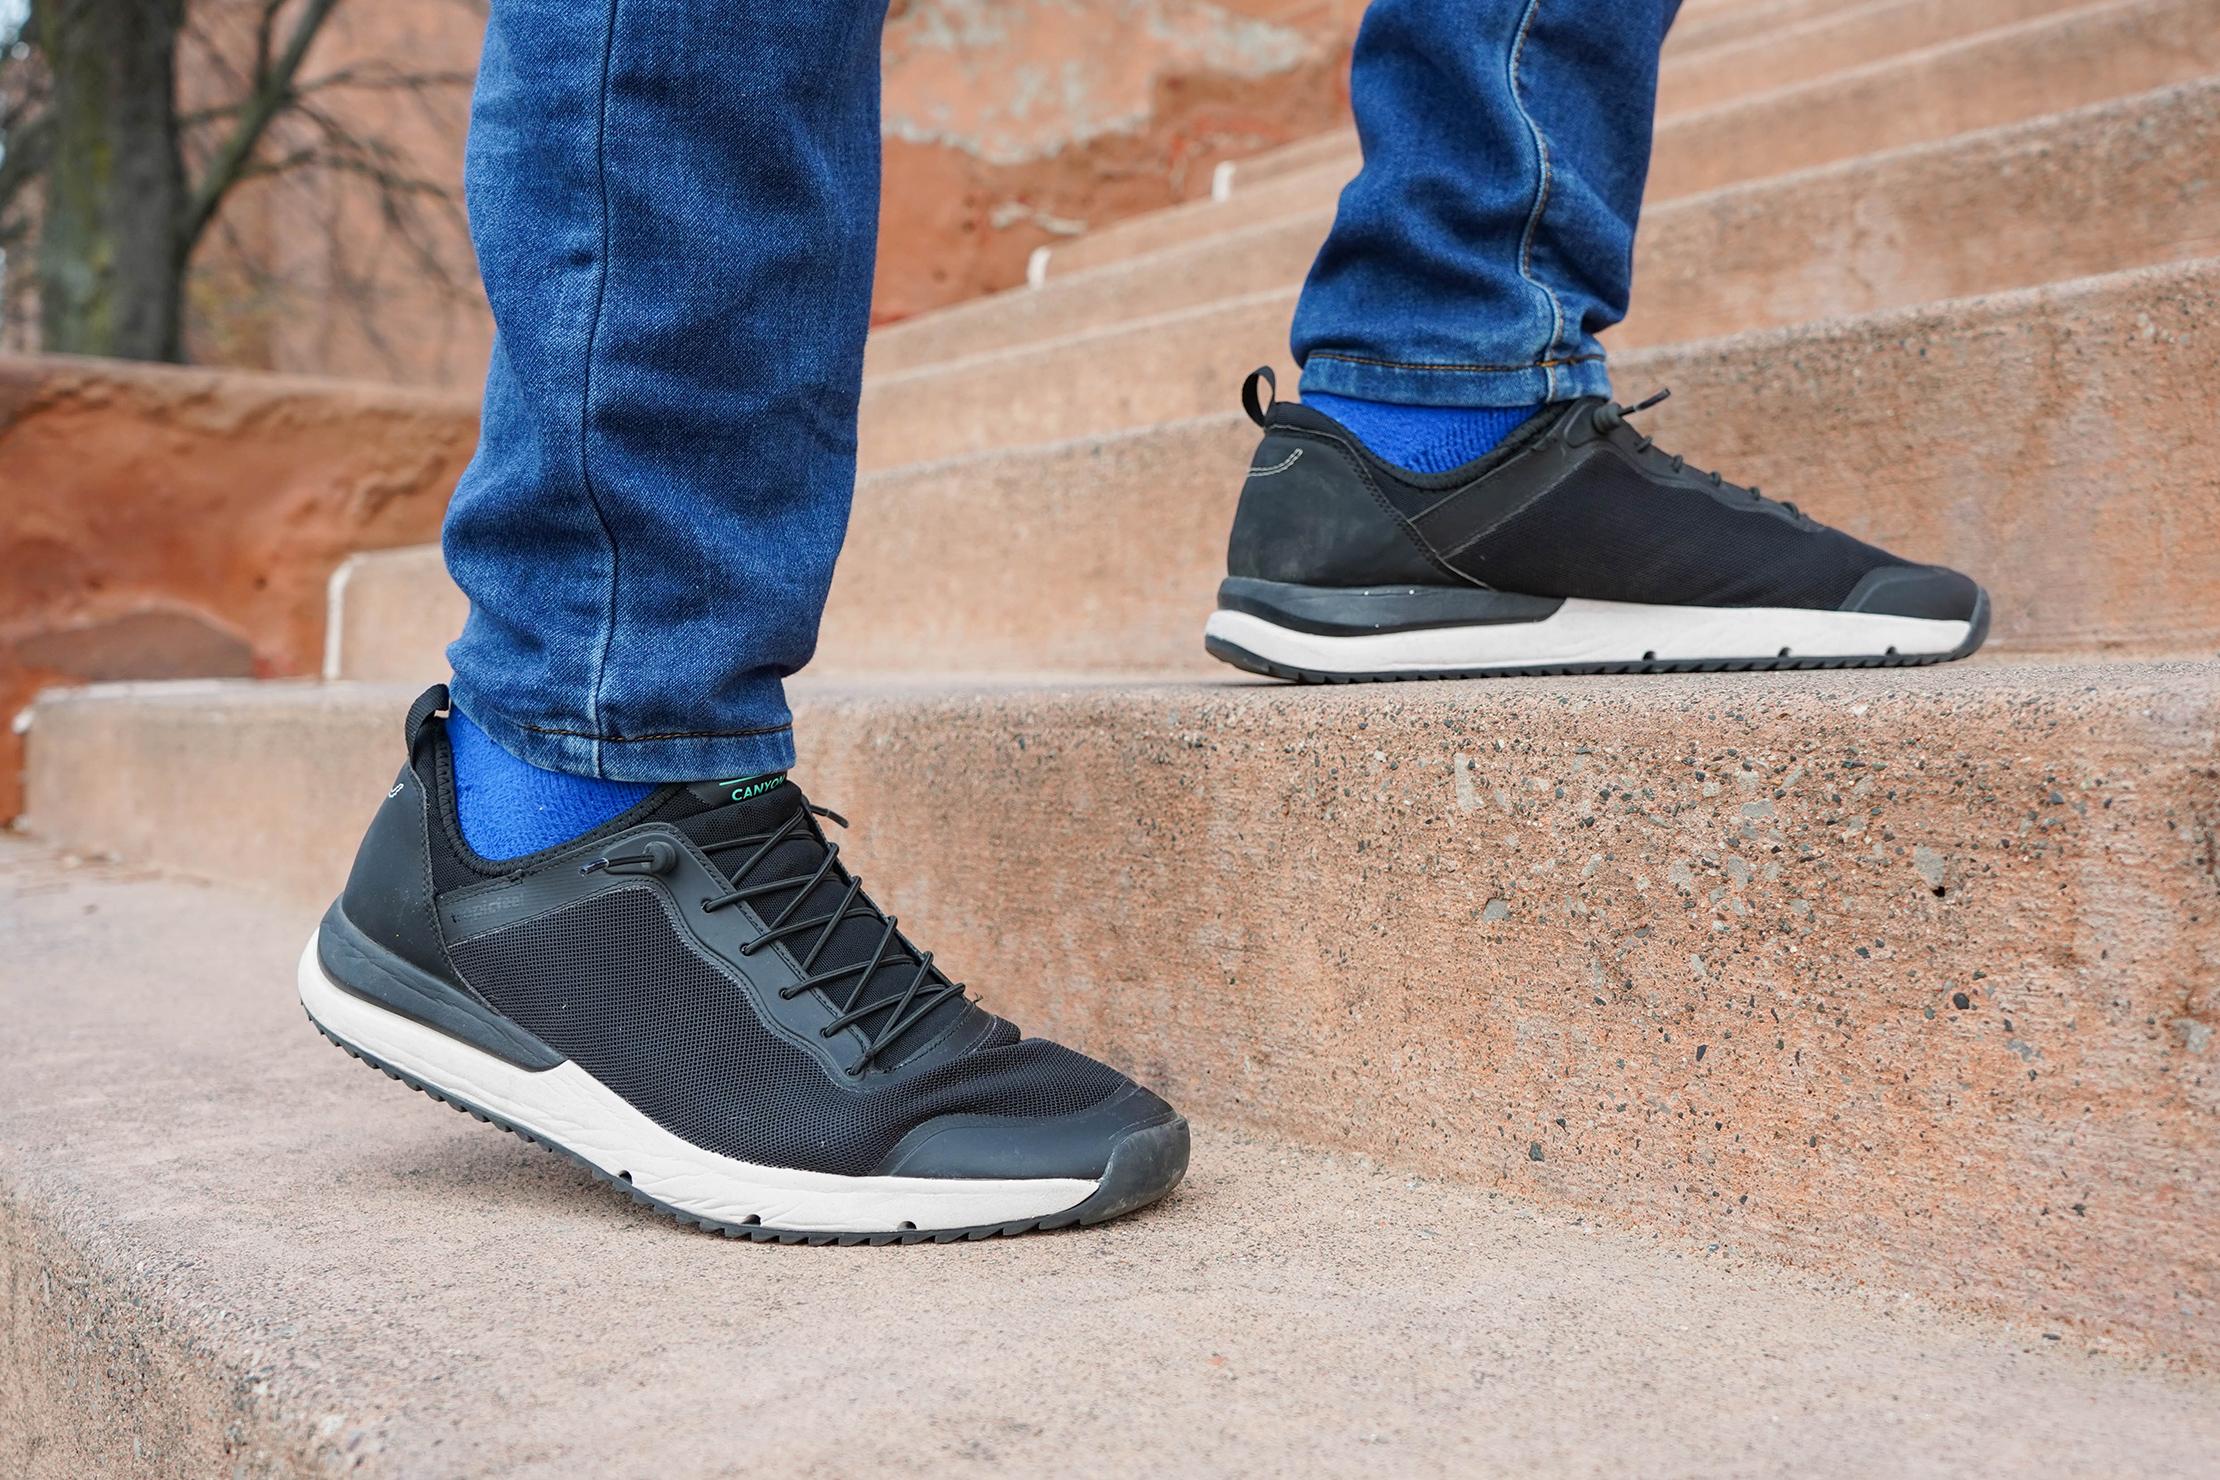 Tropicfeel Canyon Sneakers In Detroit